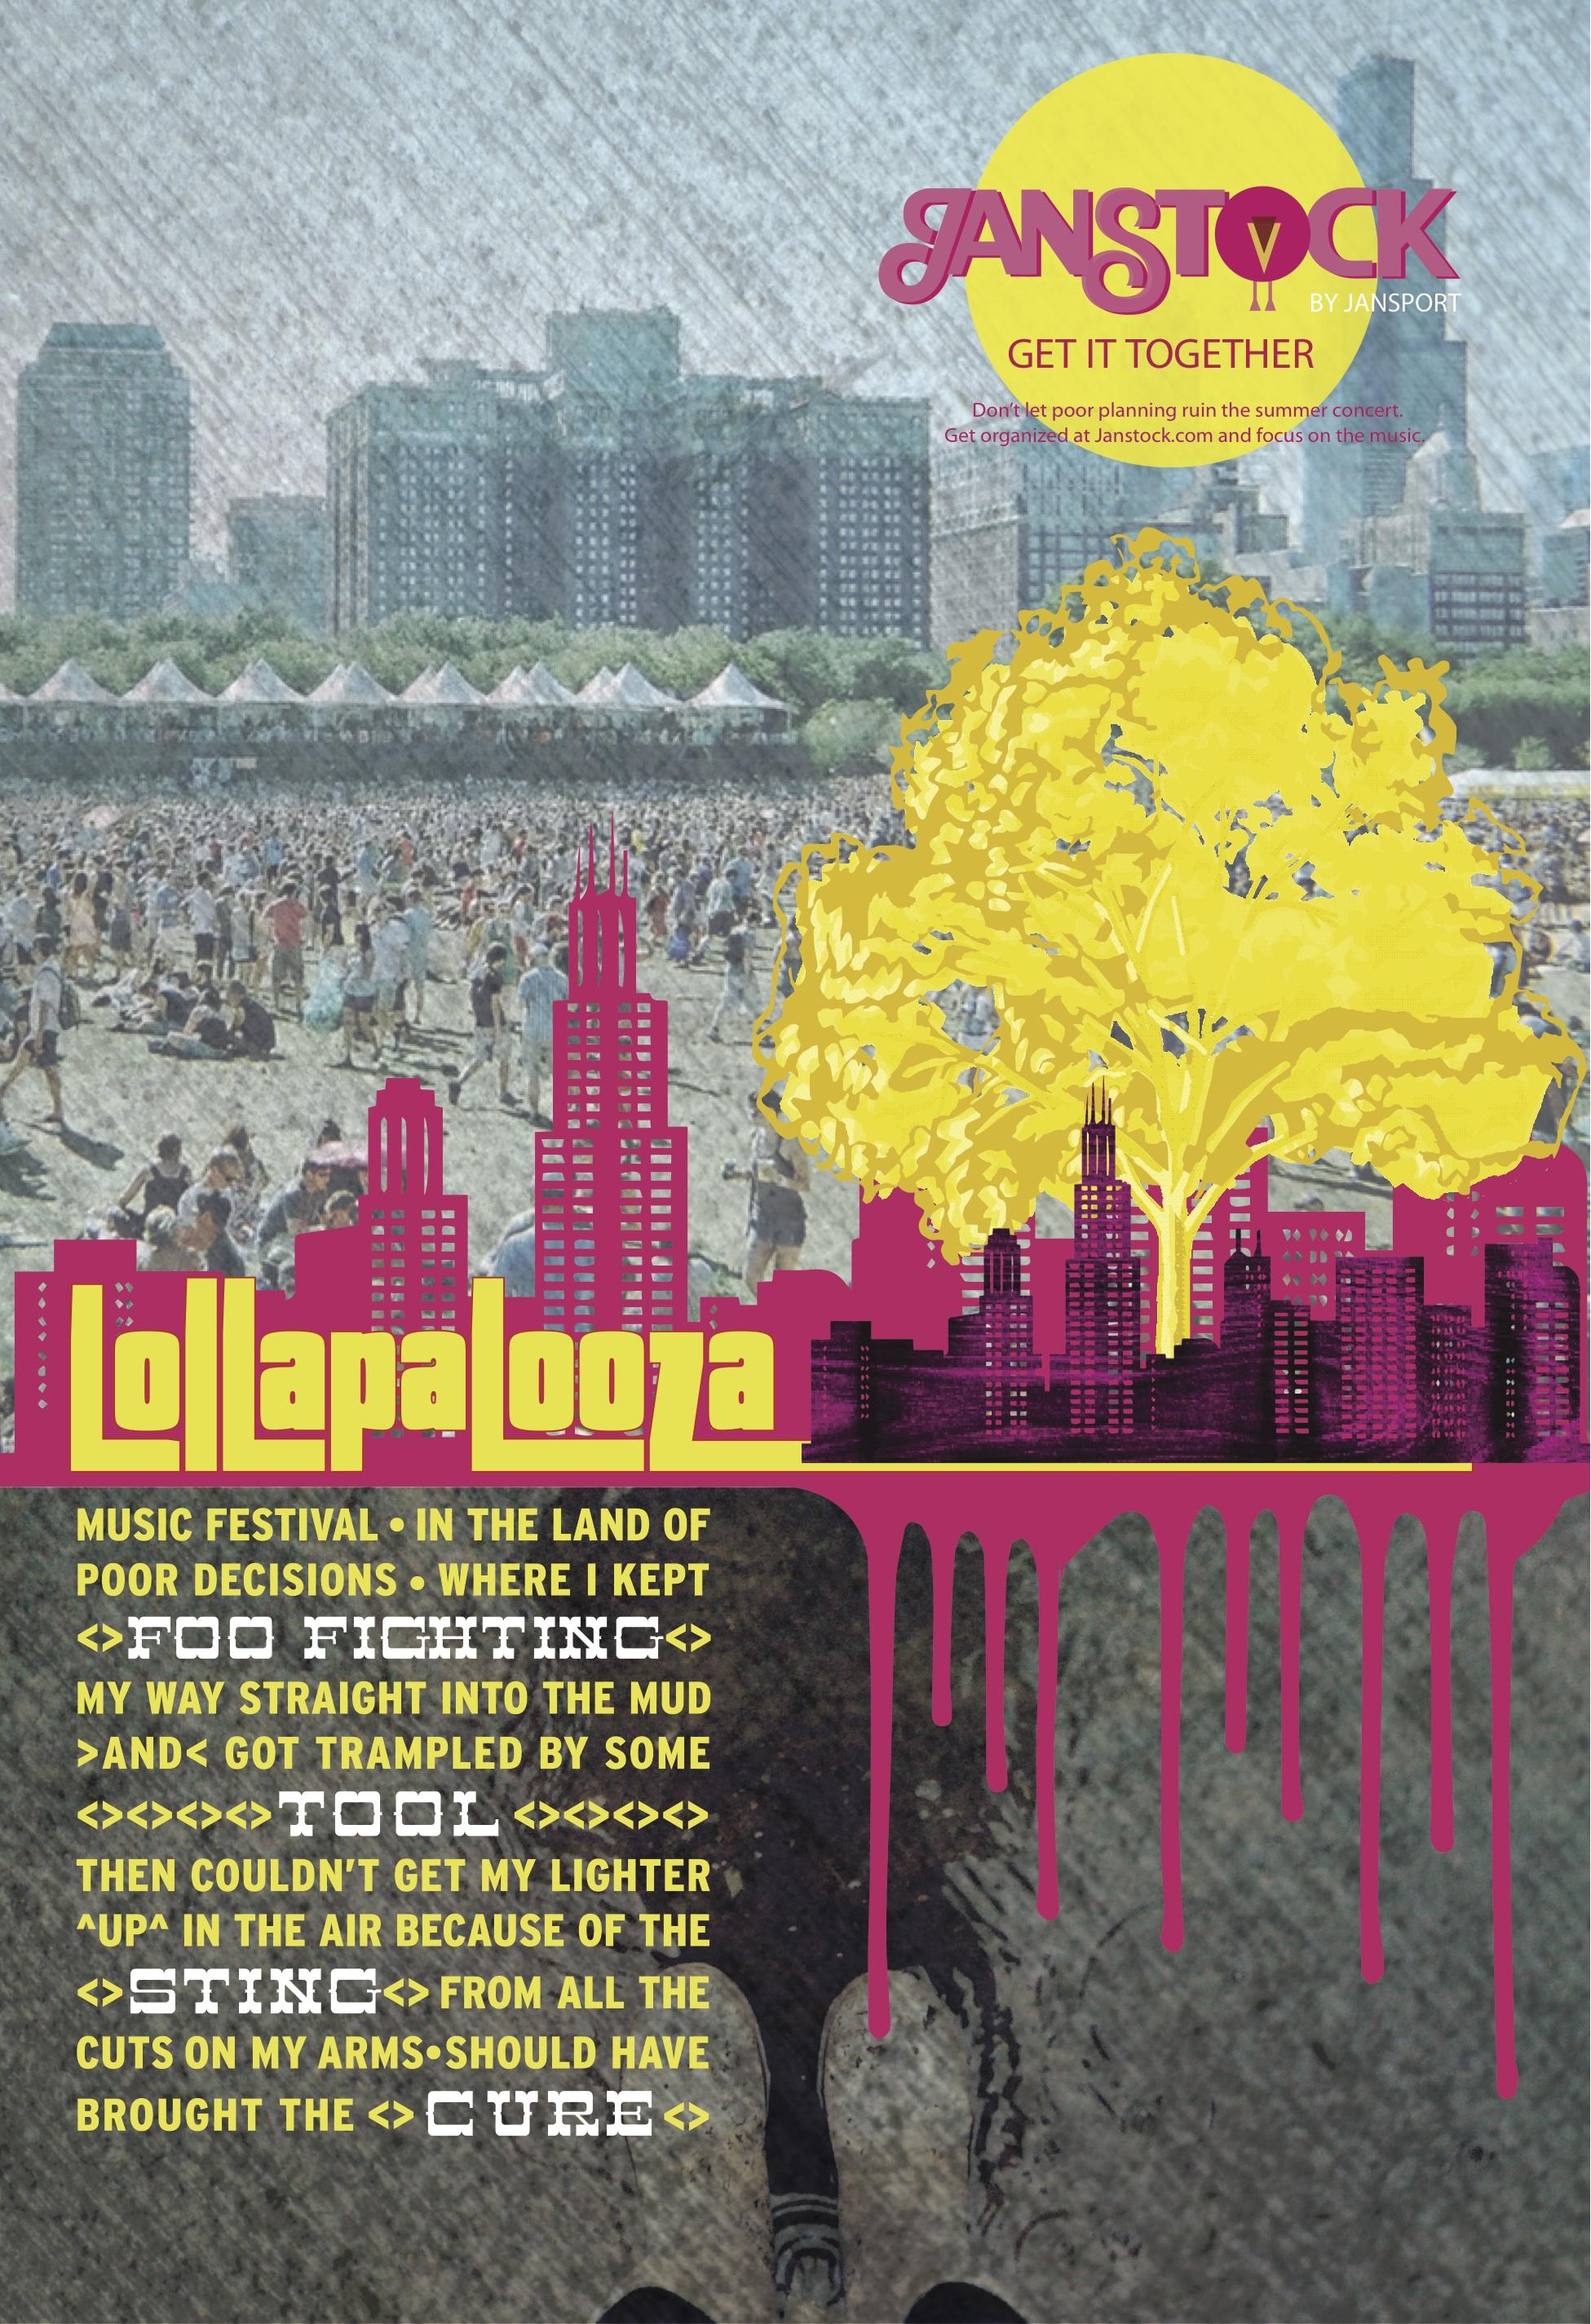 lollapofinal+copy-1.jpg